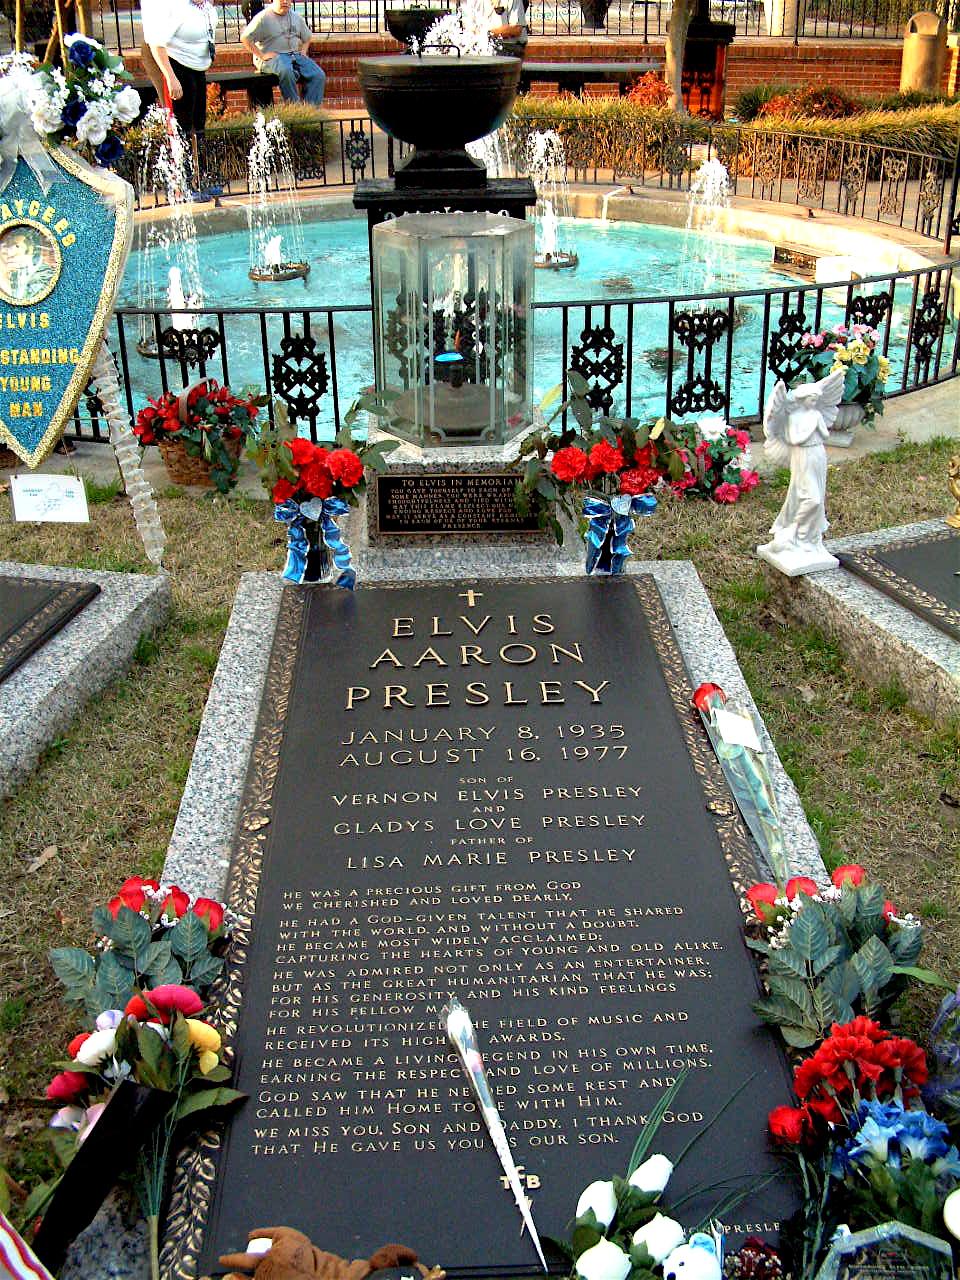 https://i1.wp.com/upload.wikimedia.org/wikipedia/commons/6/62/Elvis%27_tomb.jpg